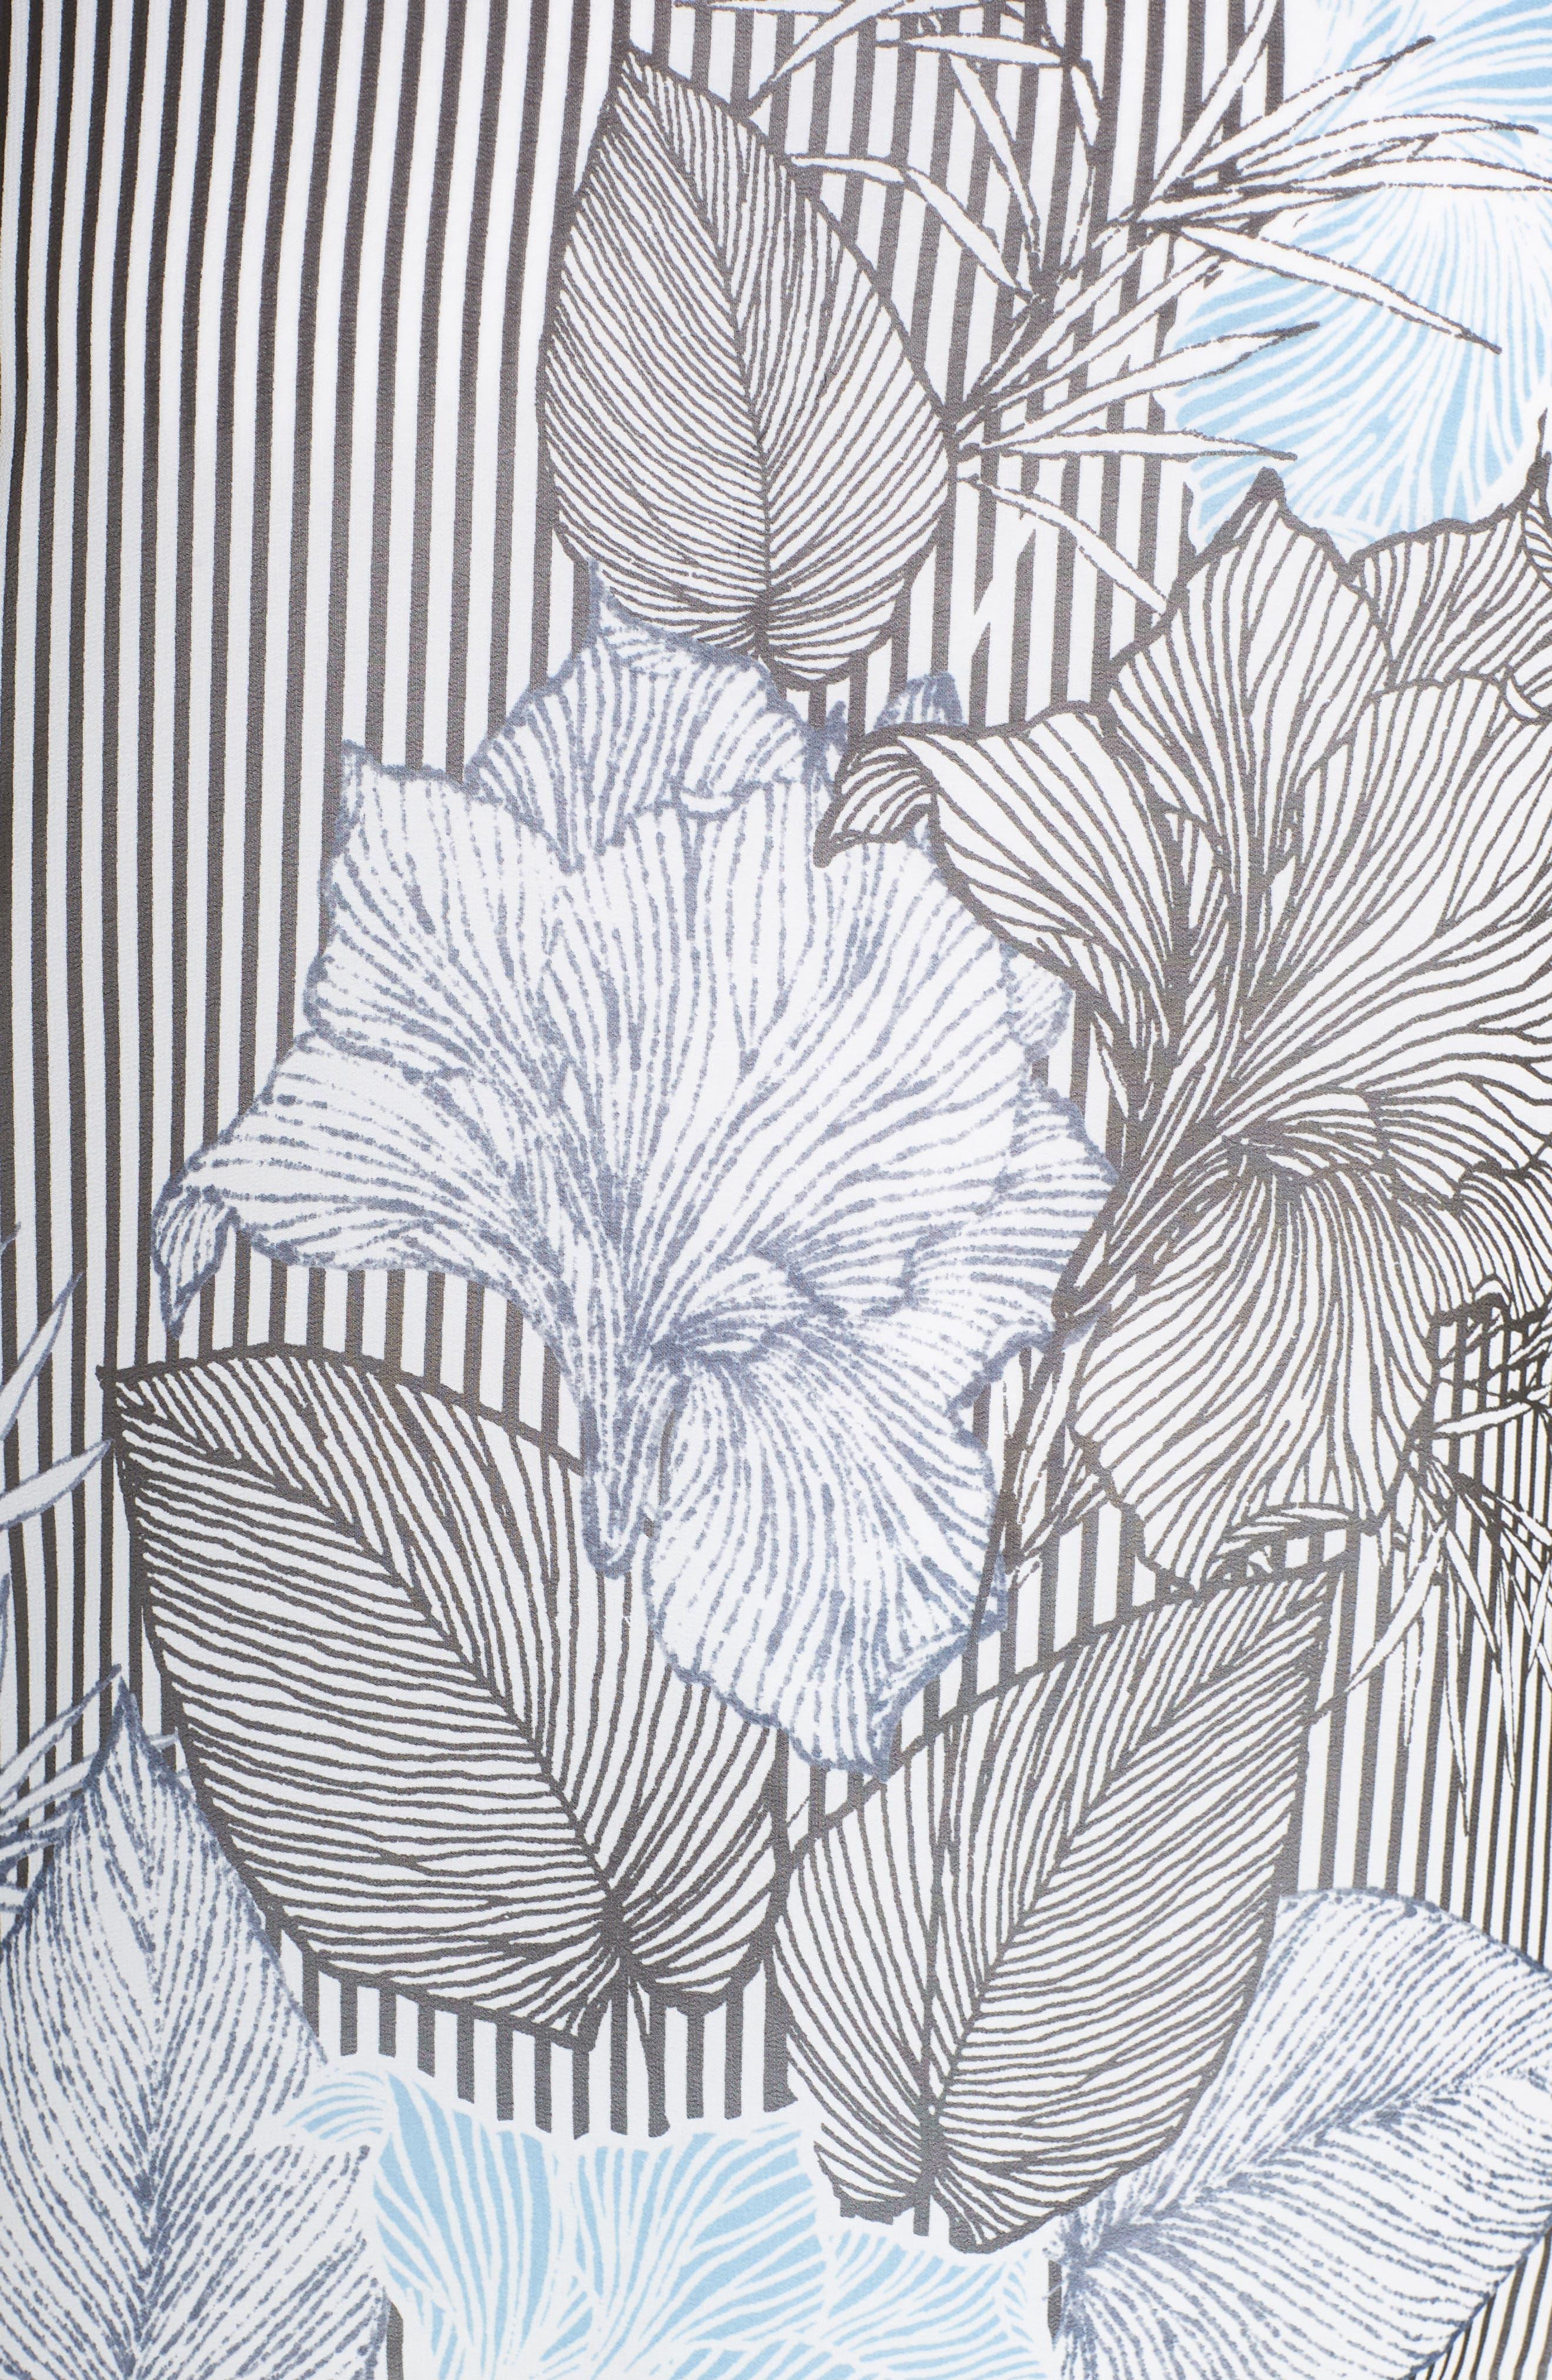 VINCE CAMUTO,                             Flutter Sleeve Etched Floral Stripe Top,                             Alternate thumbnail 6, color,                             010